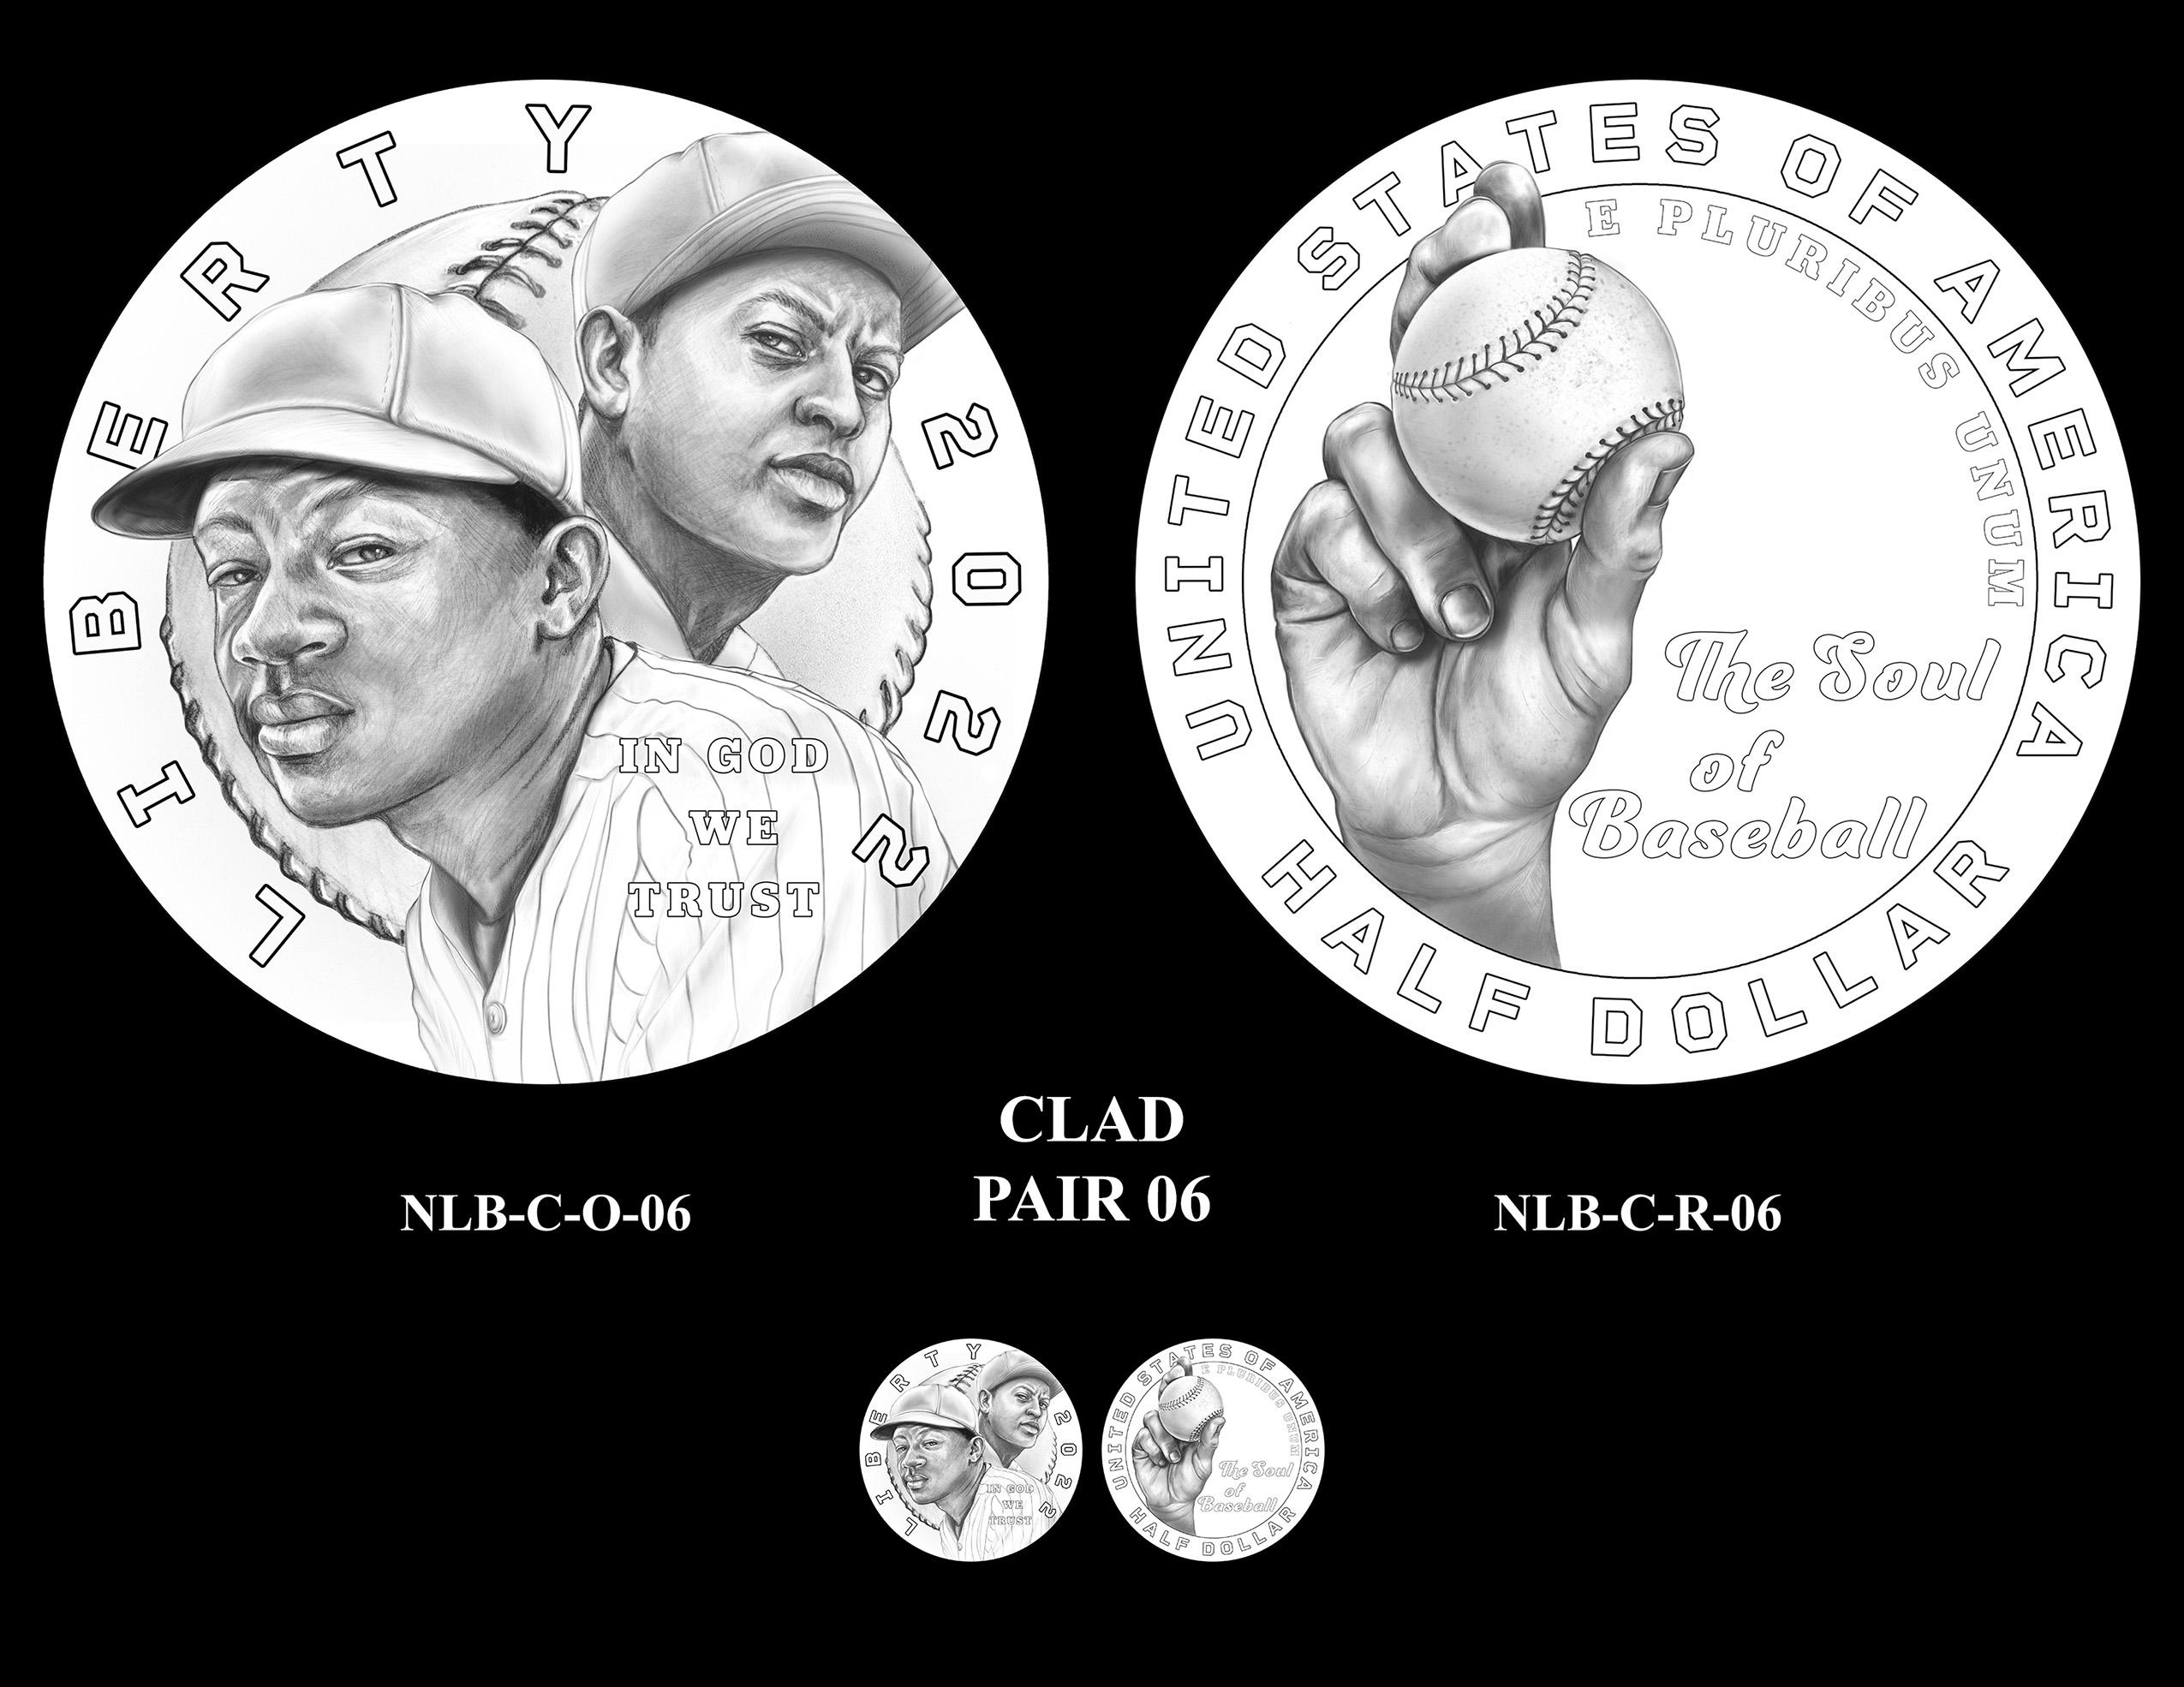 Clad Pair 06 -- Negro Leagues Baseball Commemorative Coin Program